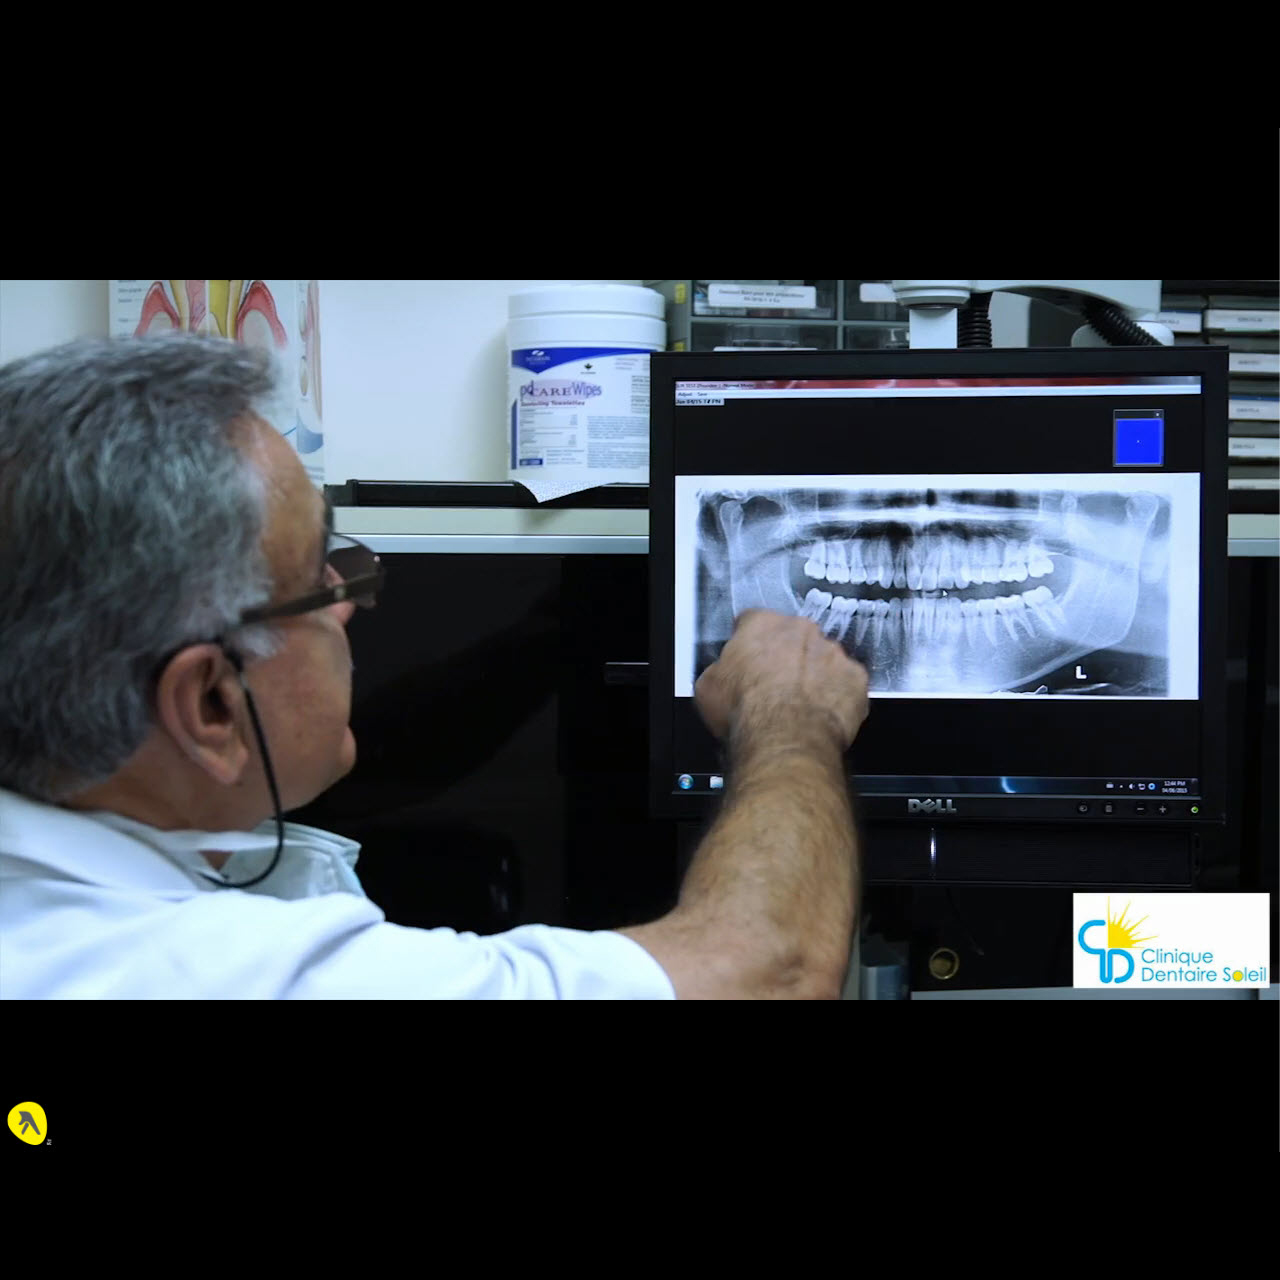 Clinique Dentaire Soleil - Dentistes - 5142771157